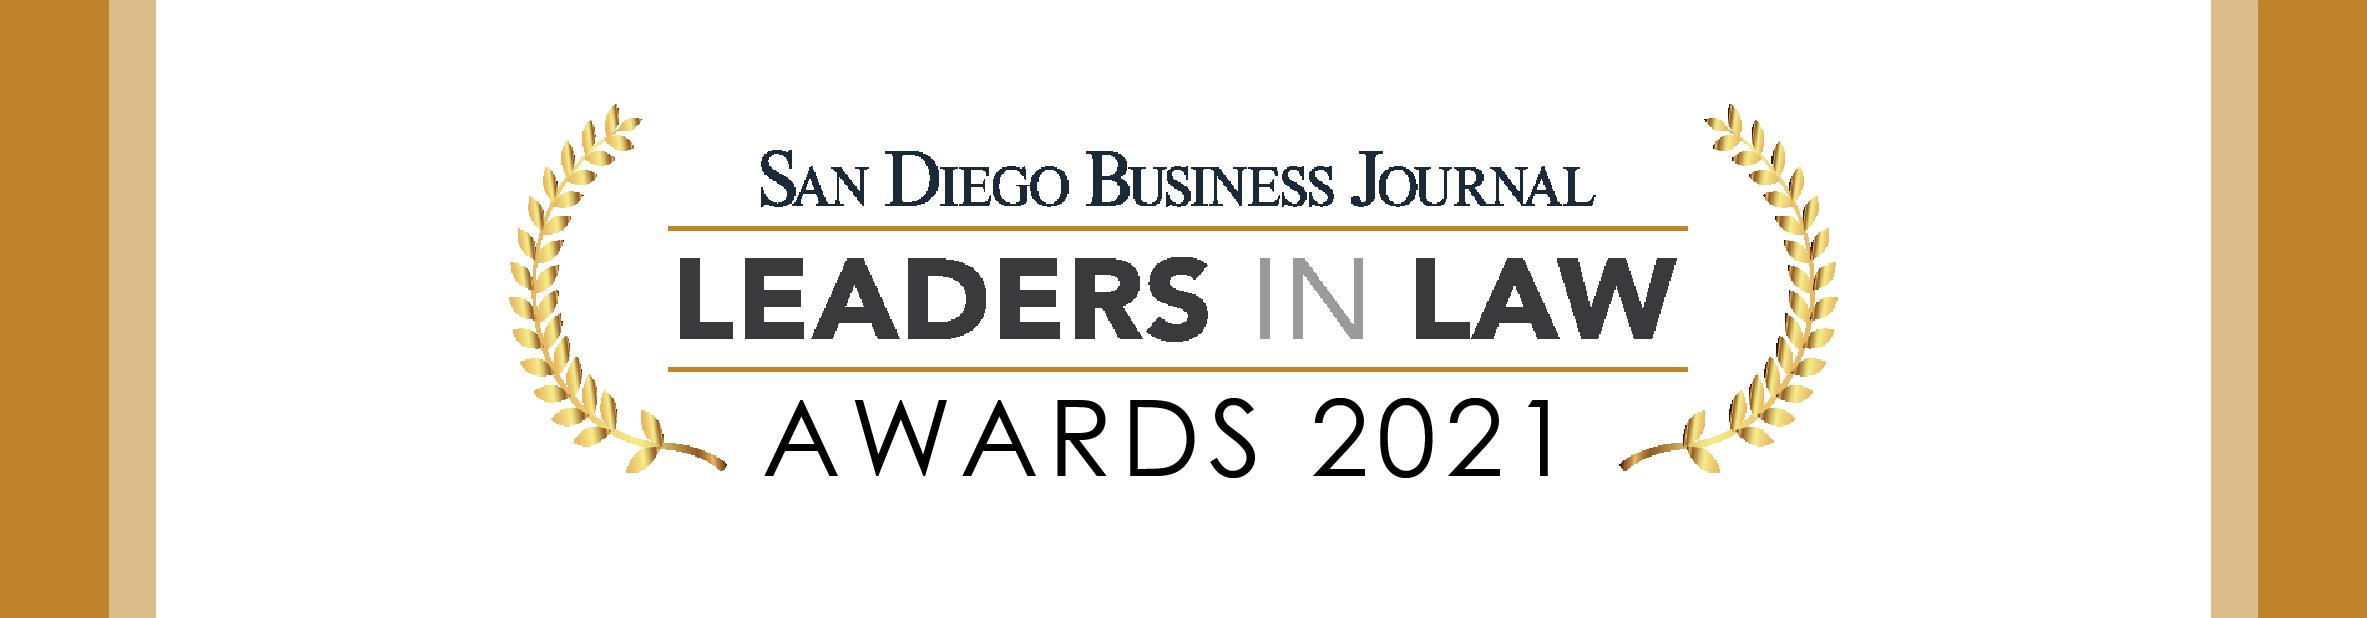 San Diego Business Journal Economics Trends